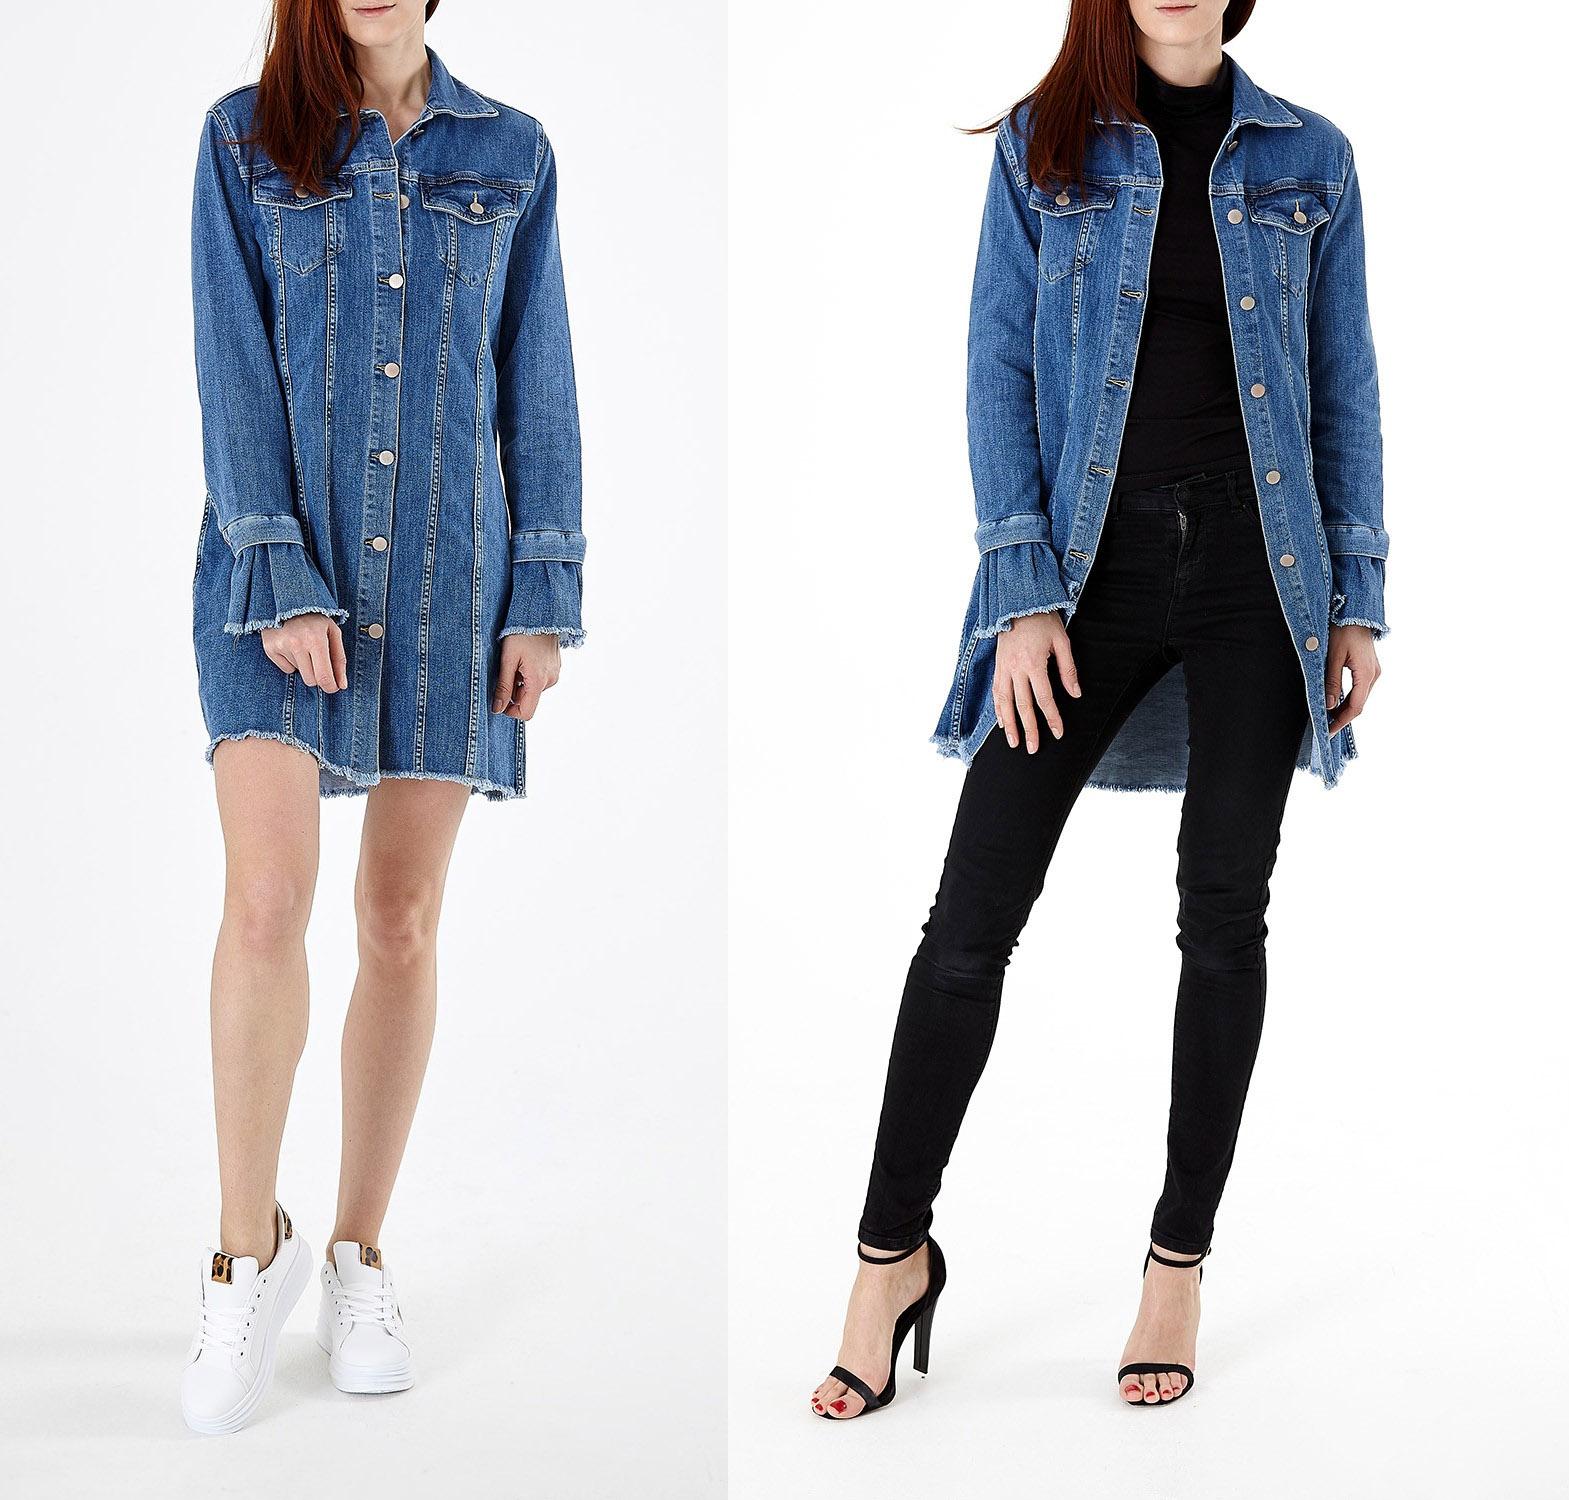 elvi fashion Denim 2 In 1 Dress Jacket